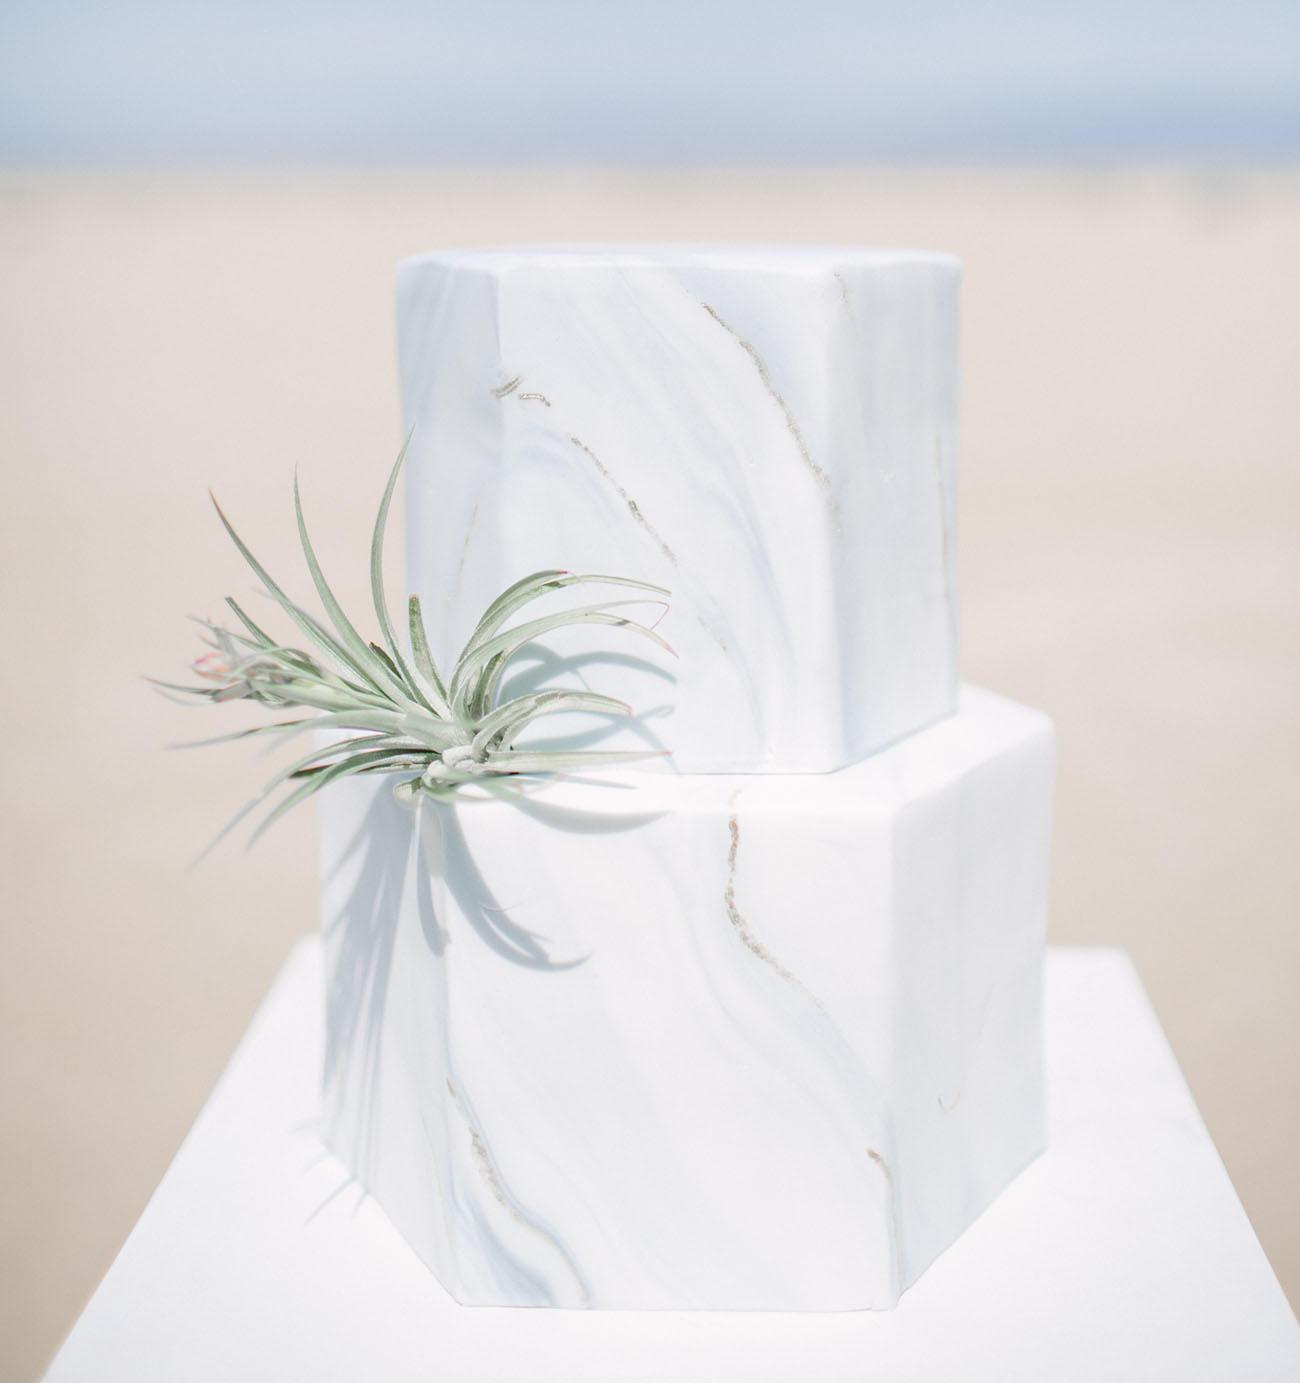 marble trend hexagonal wedding cake